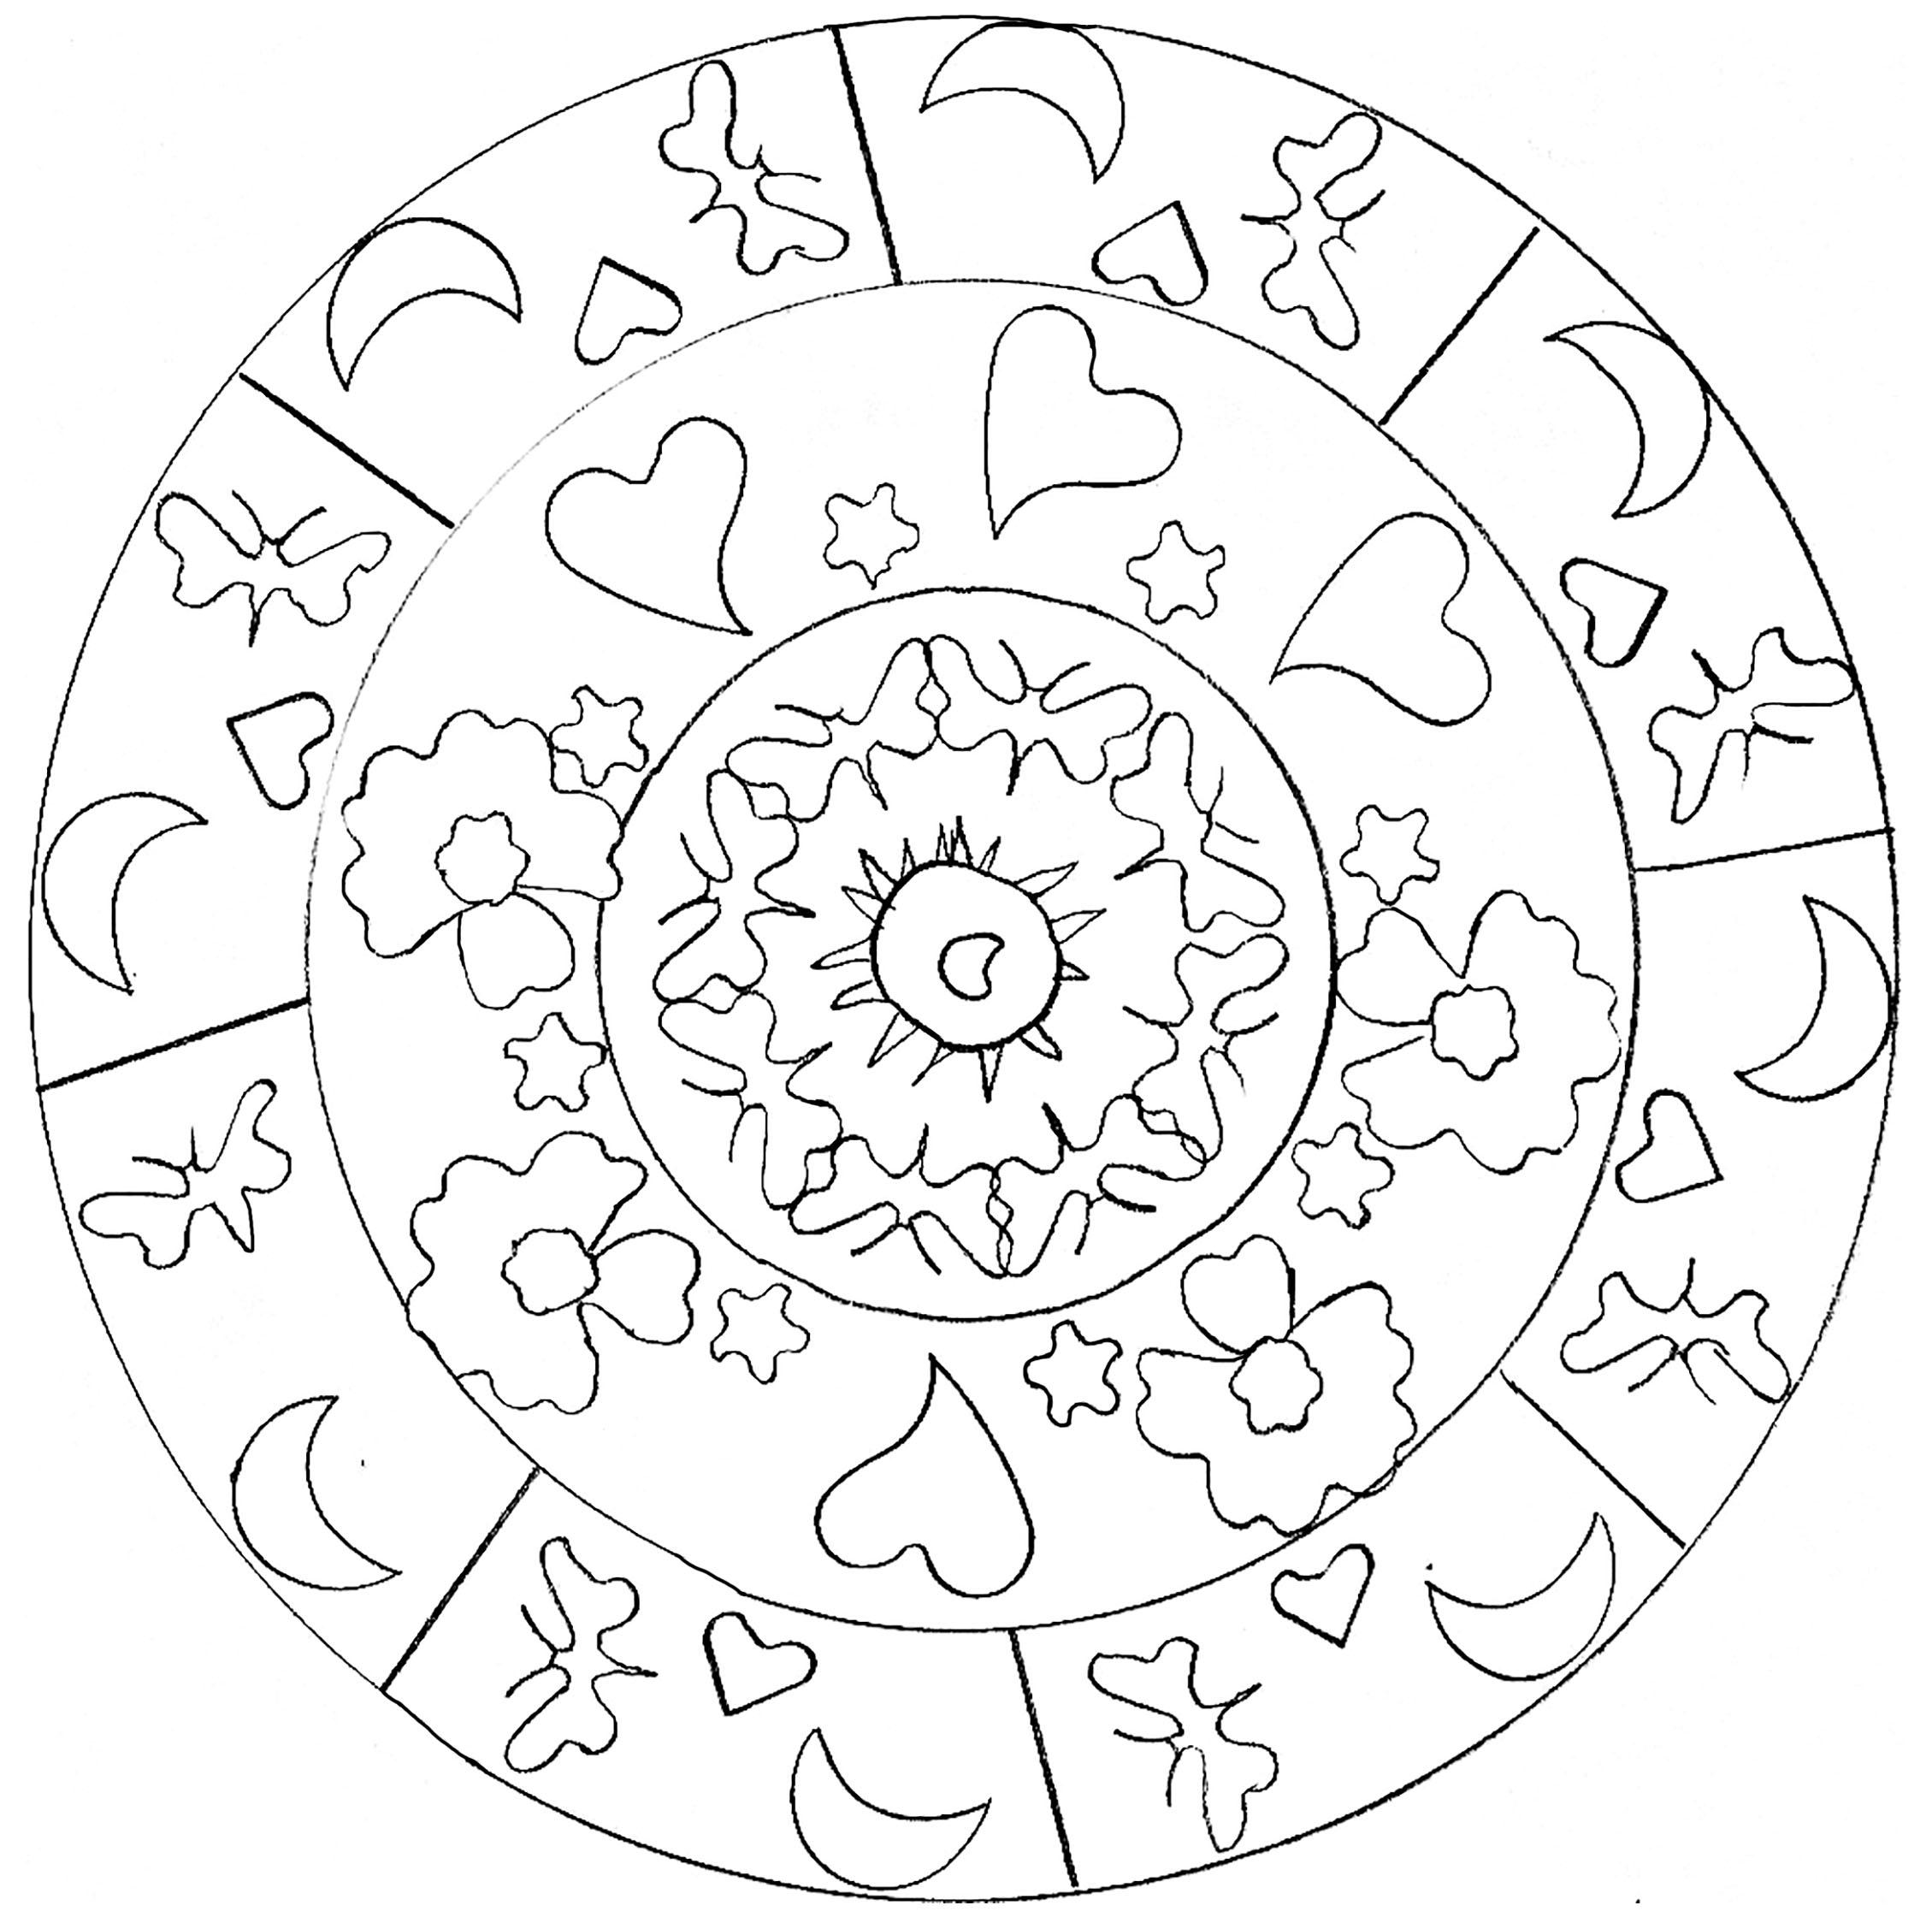 Mandala coeurs et lune par domandala 13 | Coloriage Mandalas ...